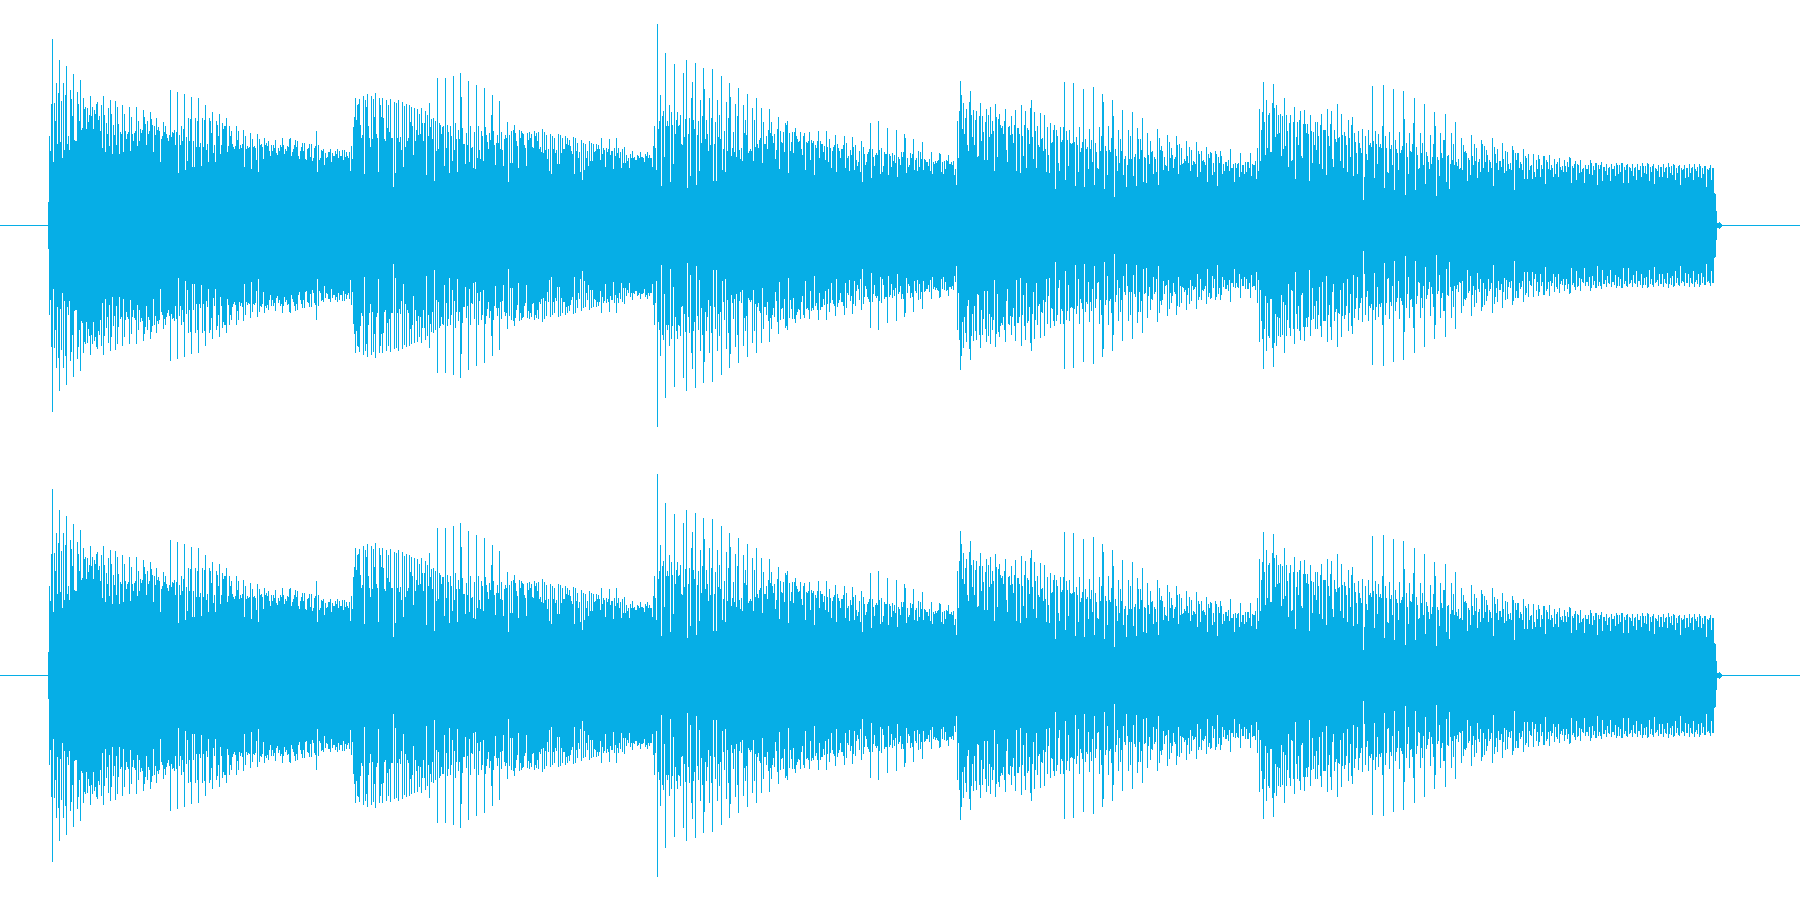 NES 汎用 B03-3(ゲームオーバーの再生済みの波形